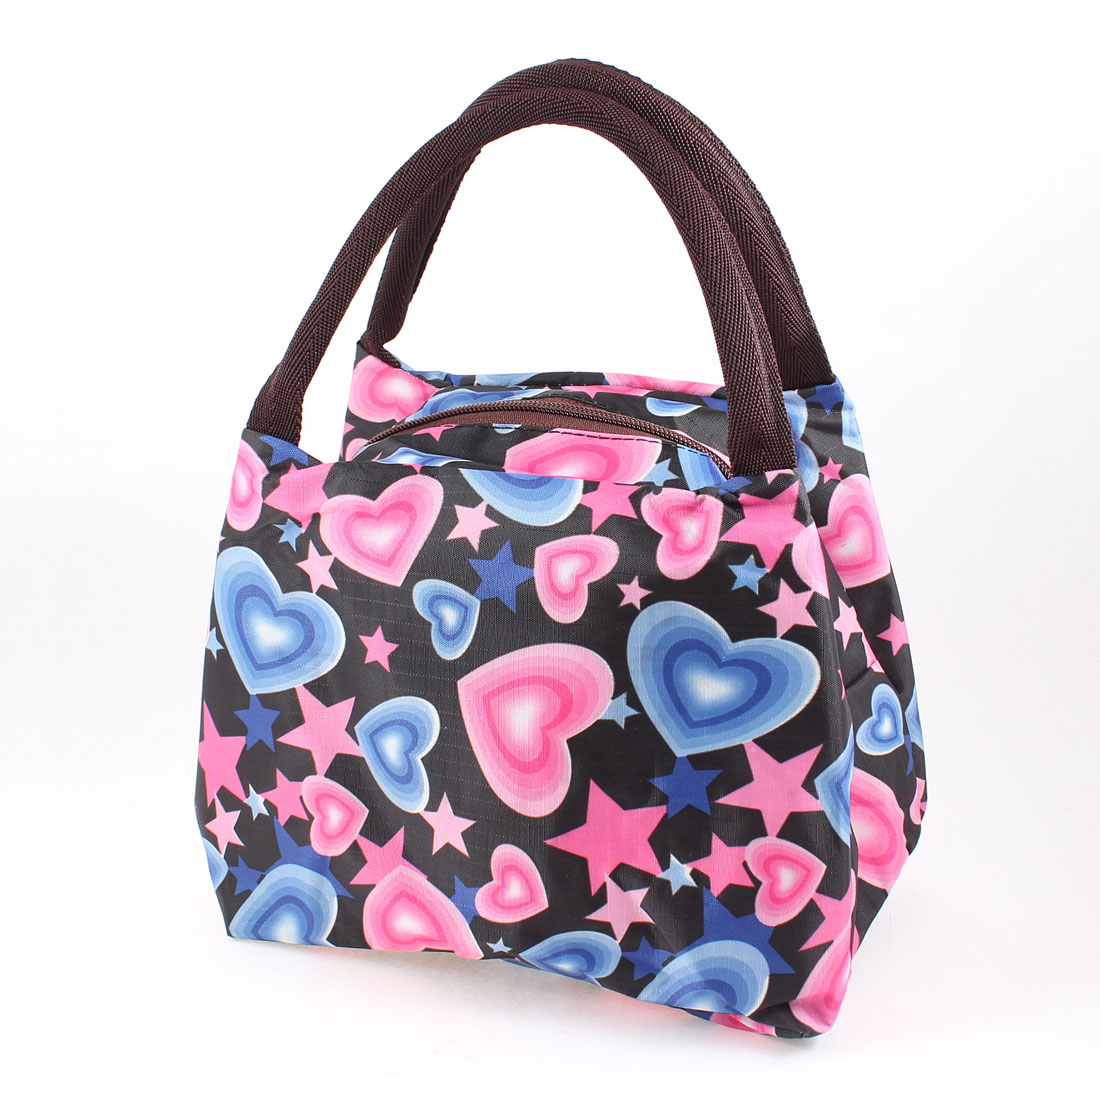 Women Heart Star Shape Prints Chocolate Color Strap Black Handbag Bag